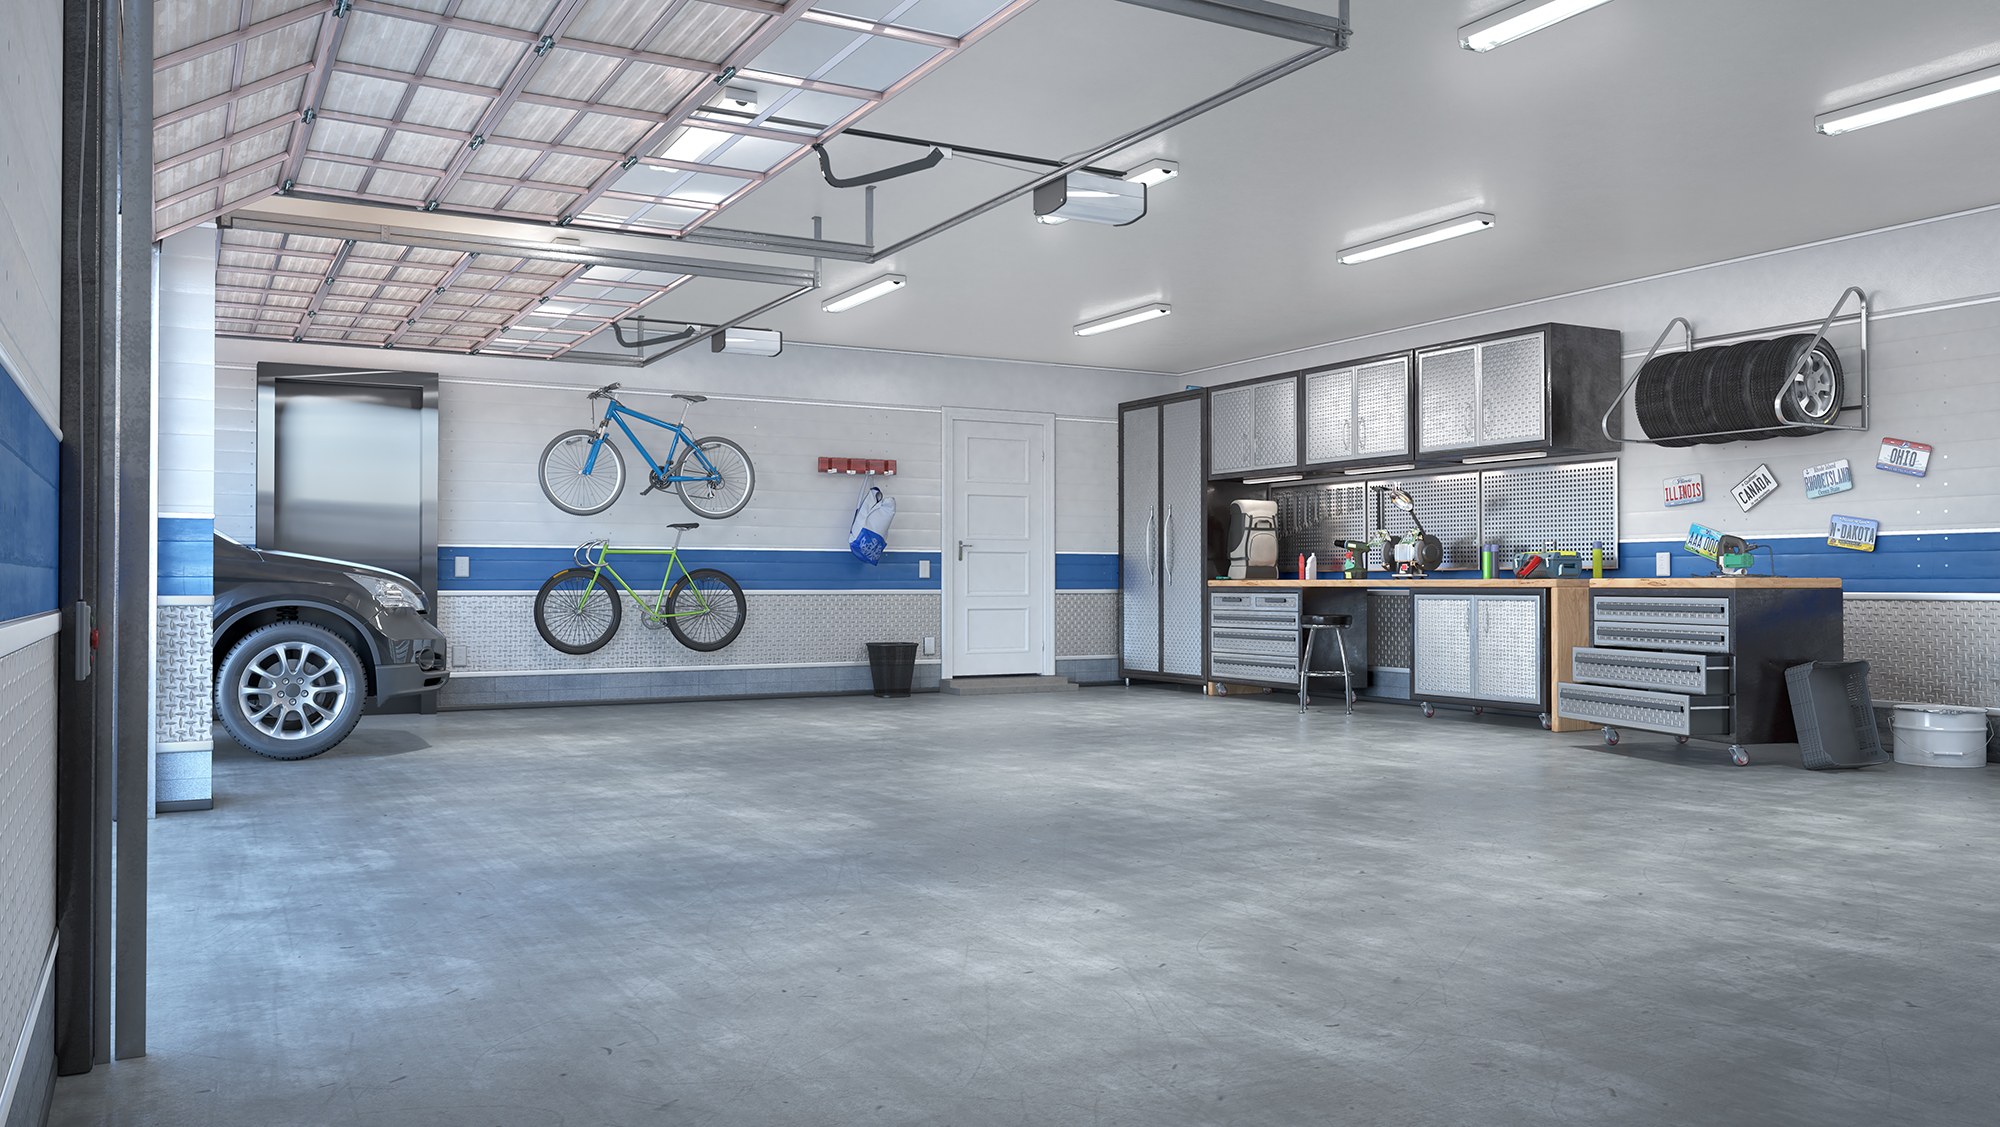 Garage with rolling gate interior. 3d illustration - Northwest Carpet Cleaning - Minneapolis Minnesota